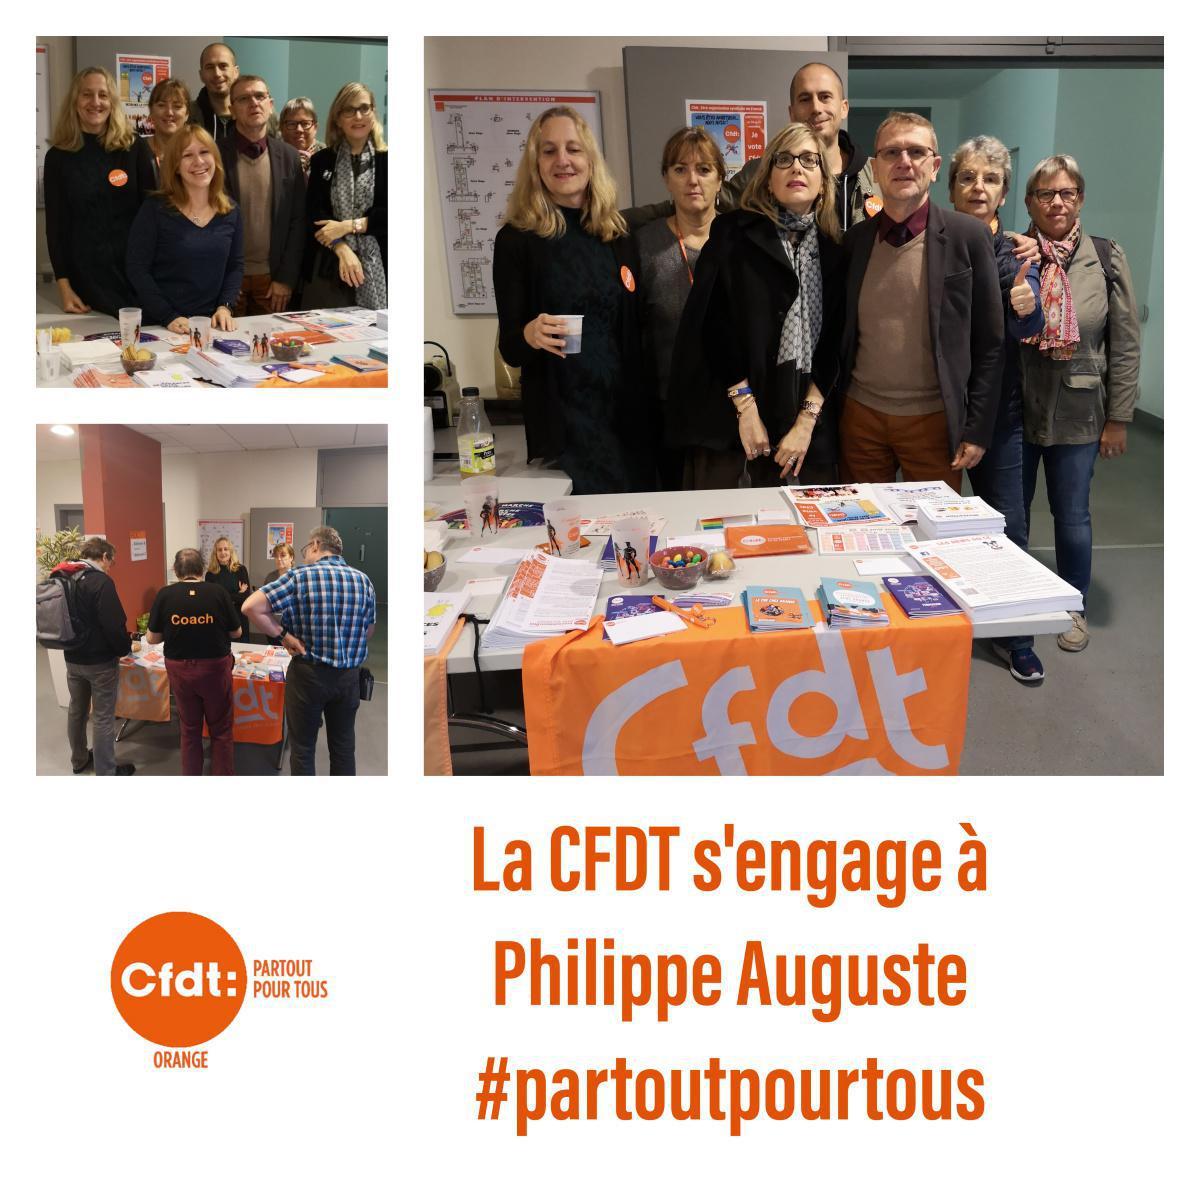 La team CFDT à Philippe Auguste